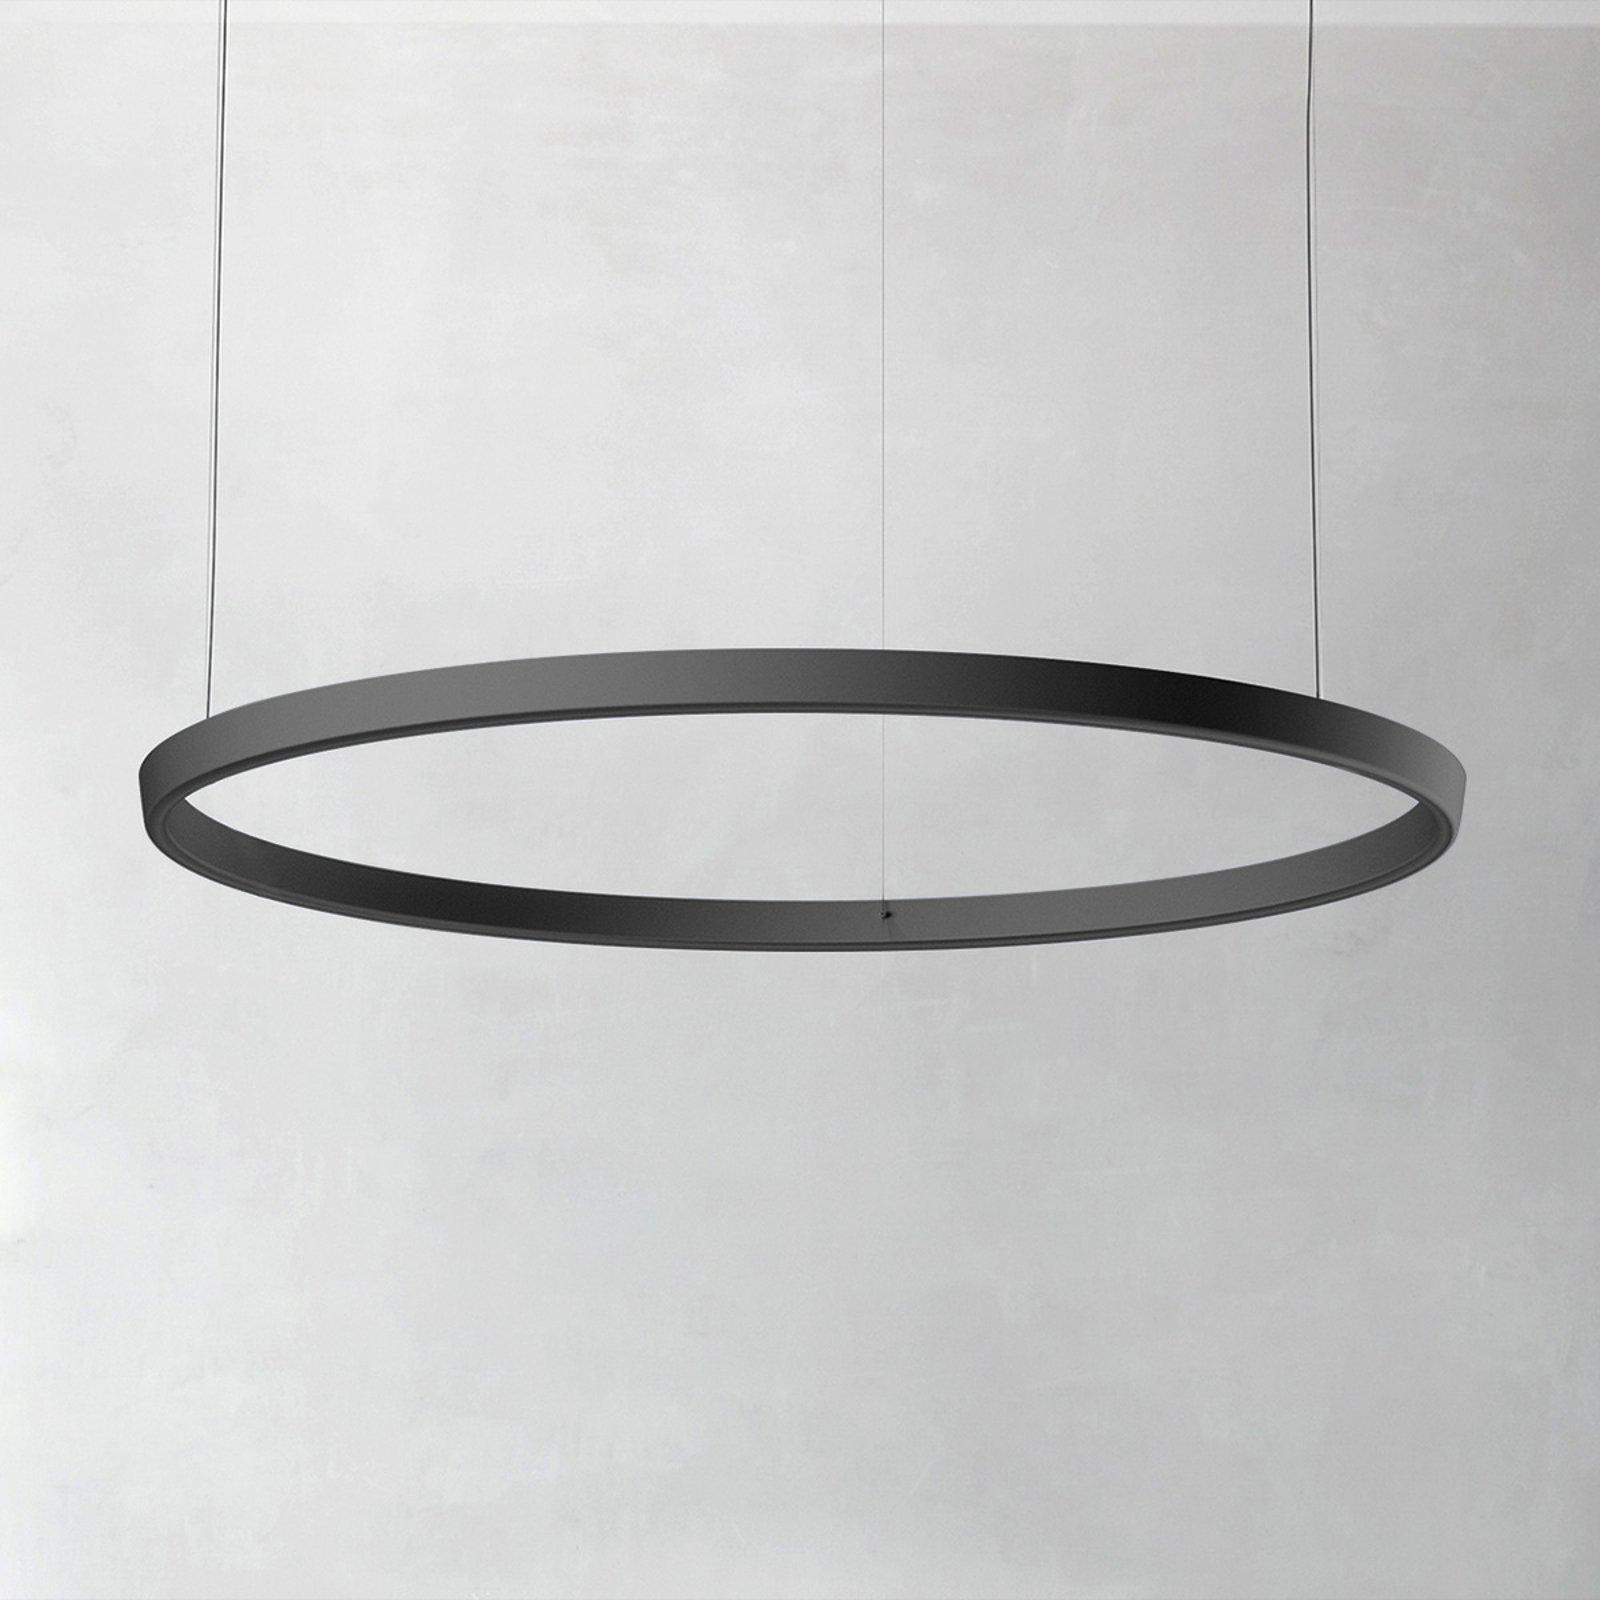 Luceplan Compendium Circle 110 cm, svart